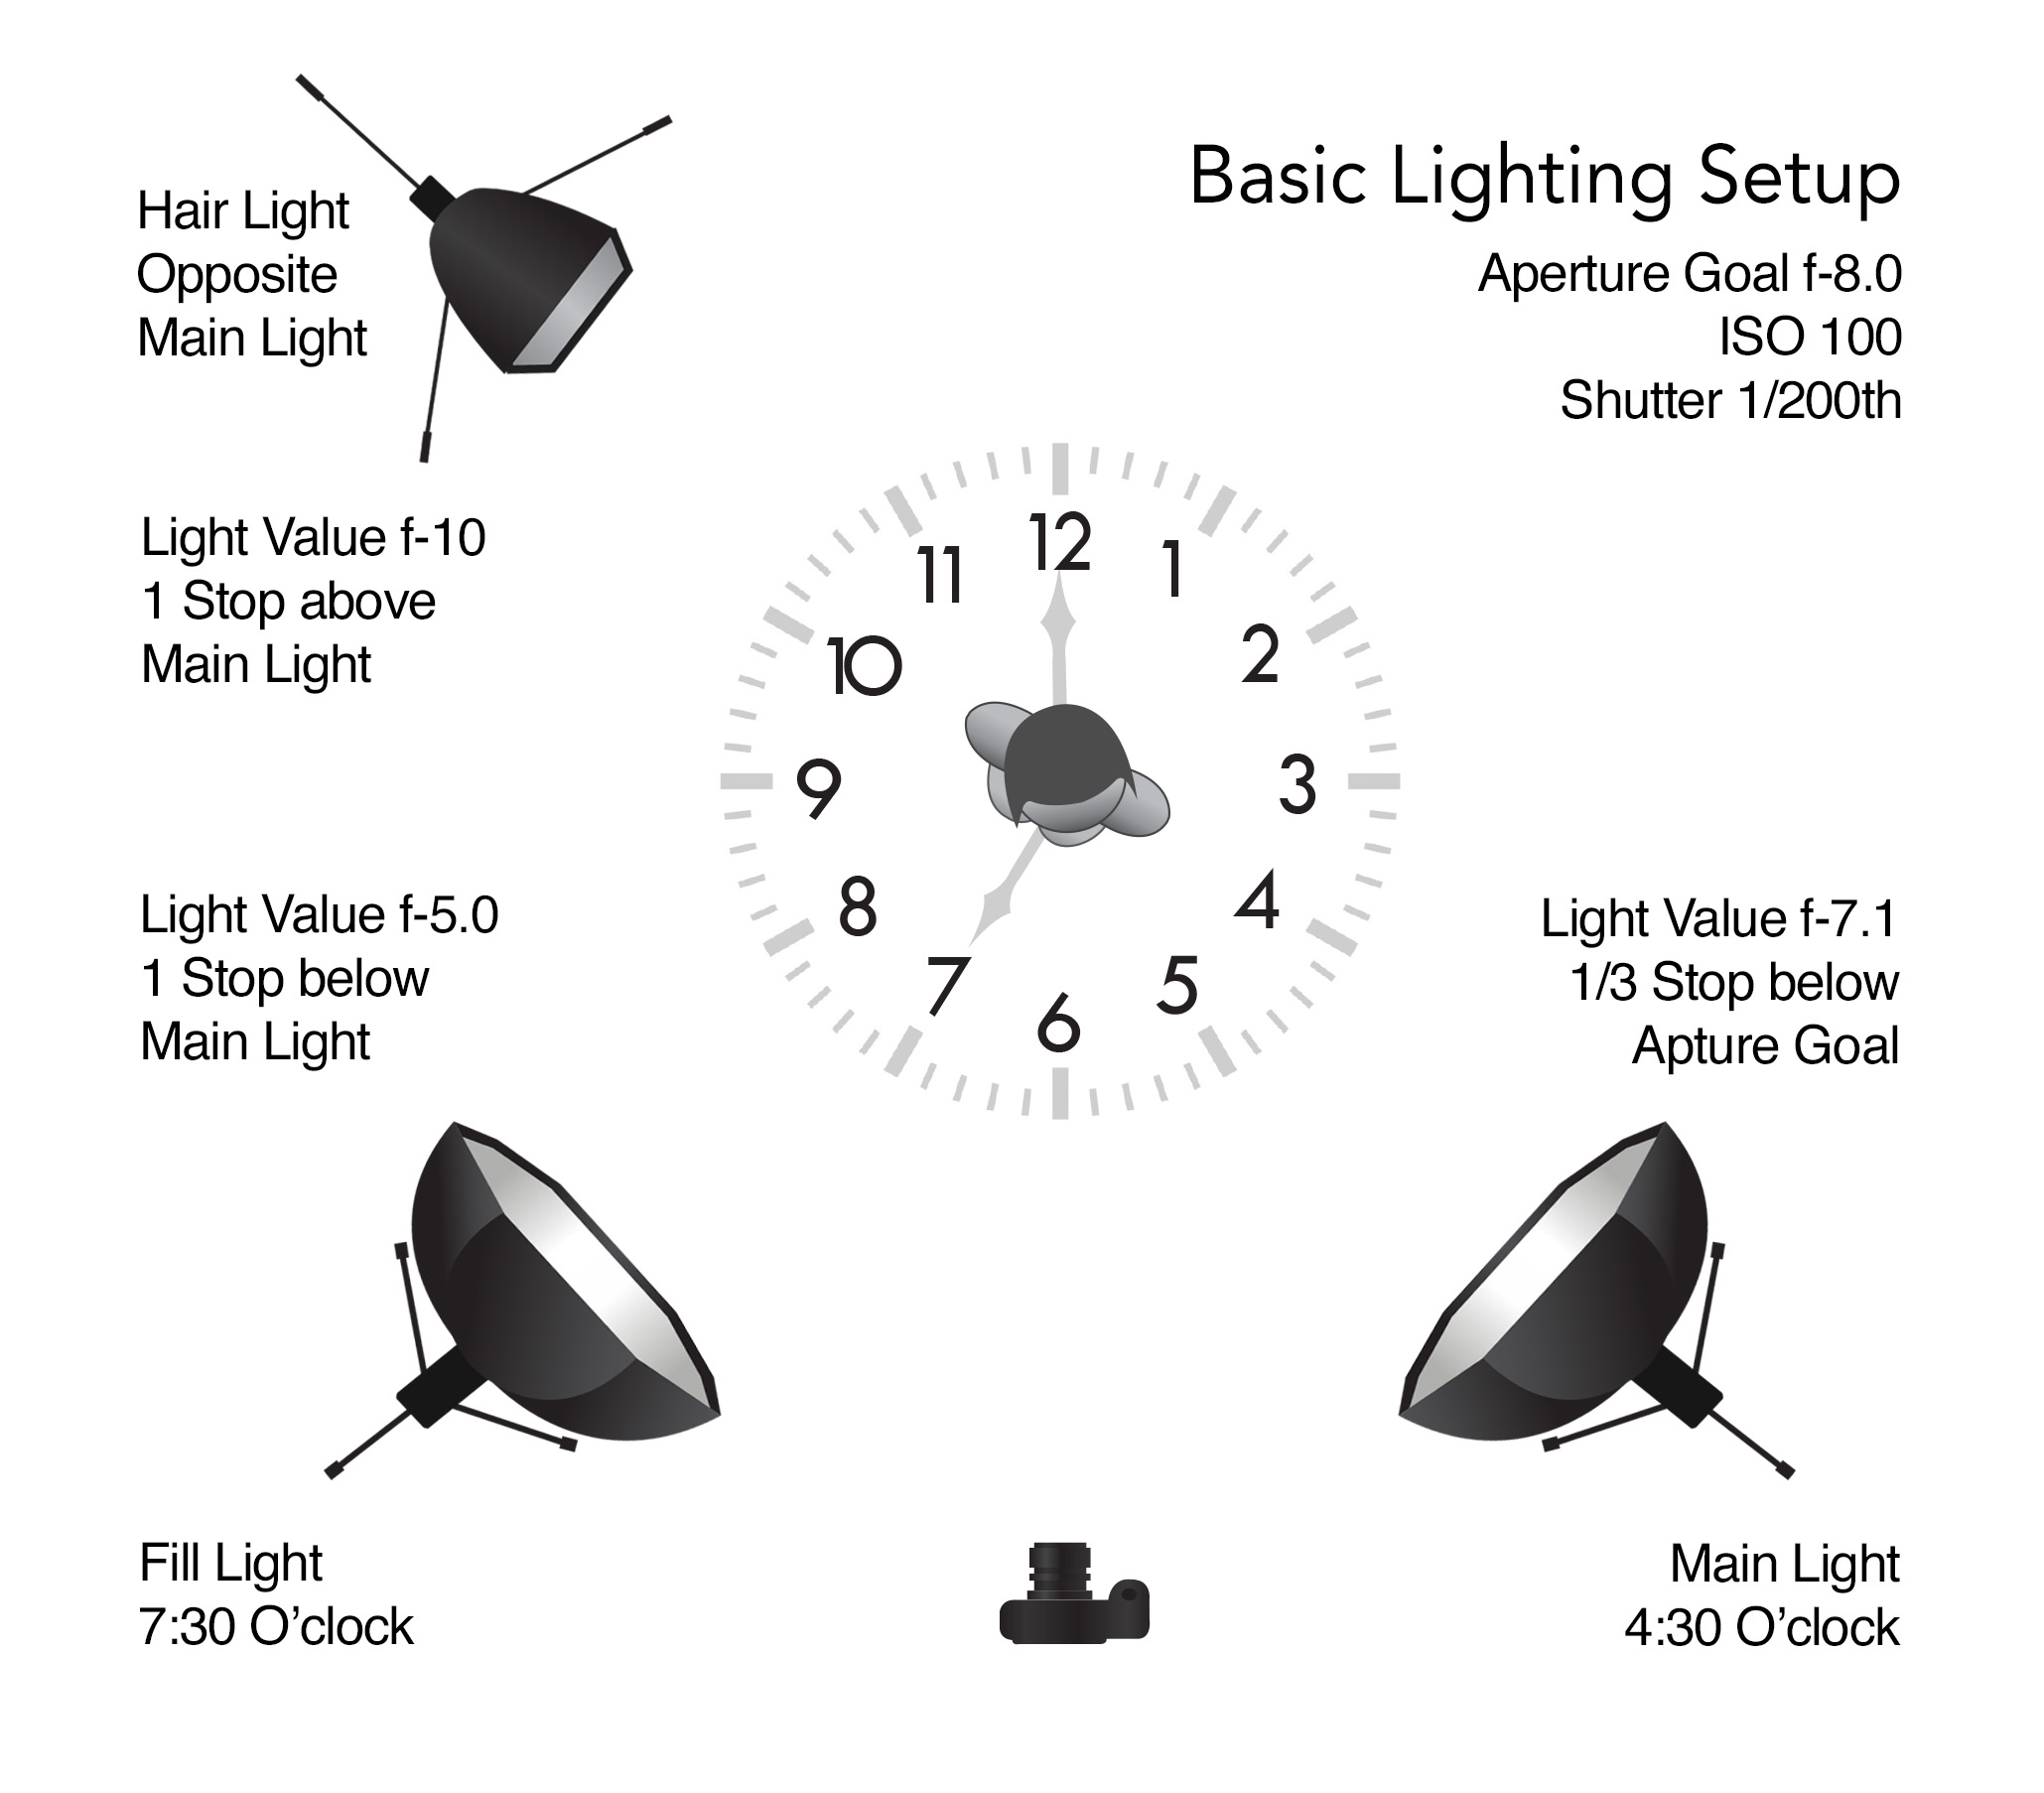 Formula One for Basic Lighting Setup